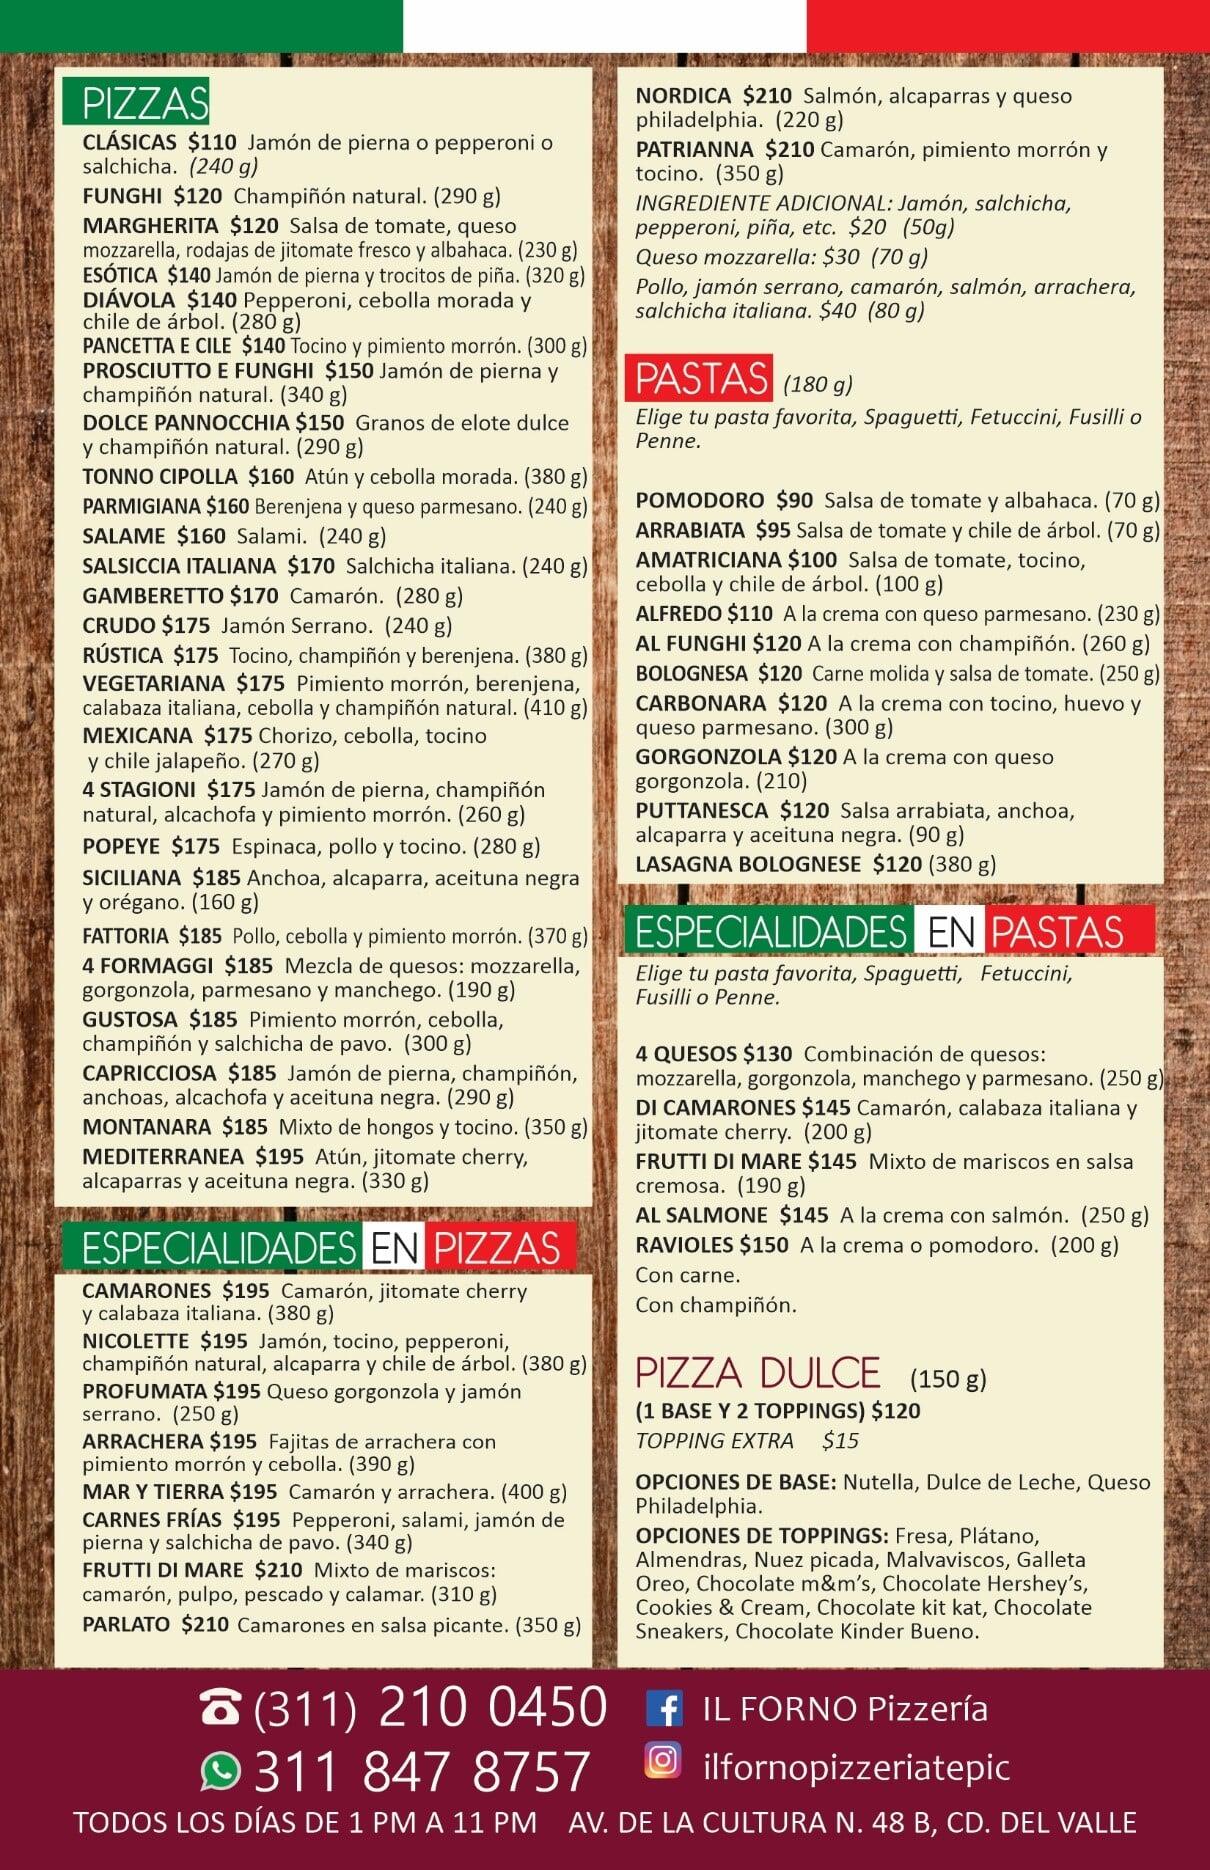 IL FORNO PIZZERÍA- pizzas